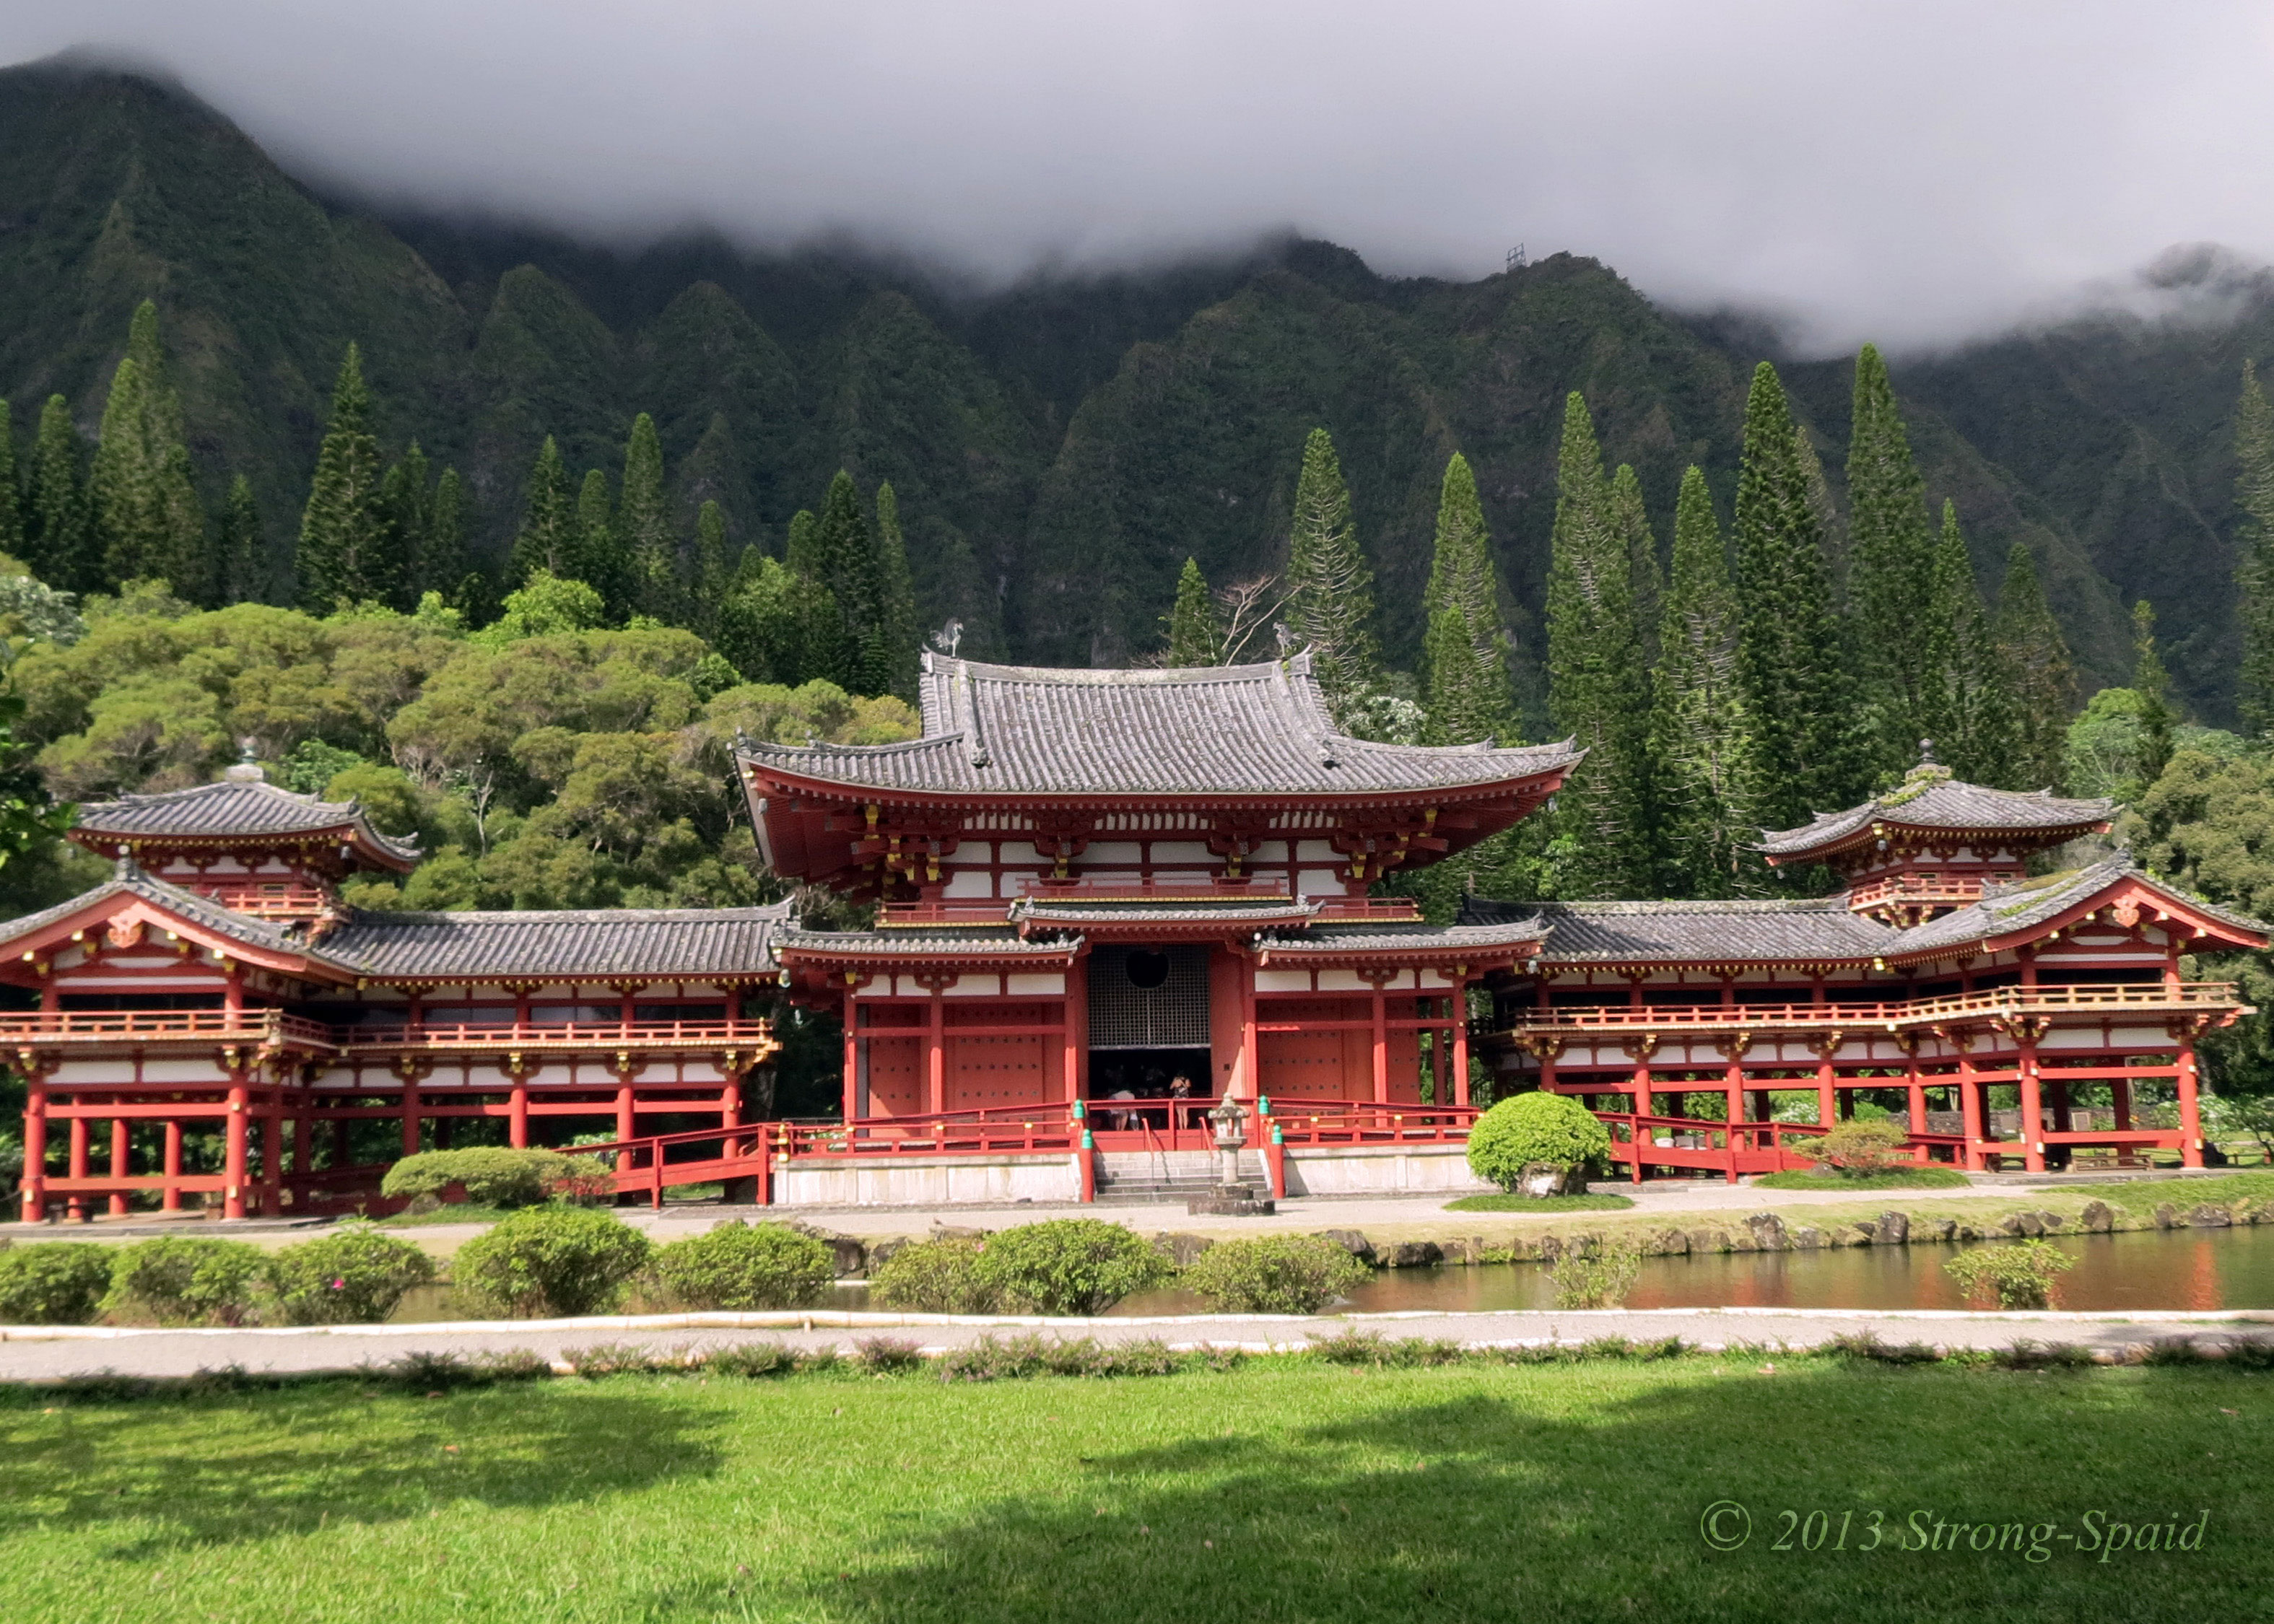 (1) Uji Walking & Tea Ceremony Tour   (2) Uji & Nara 1-Day Tour